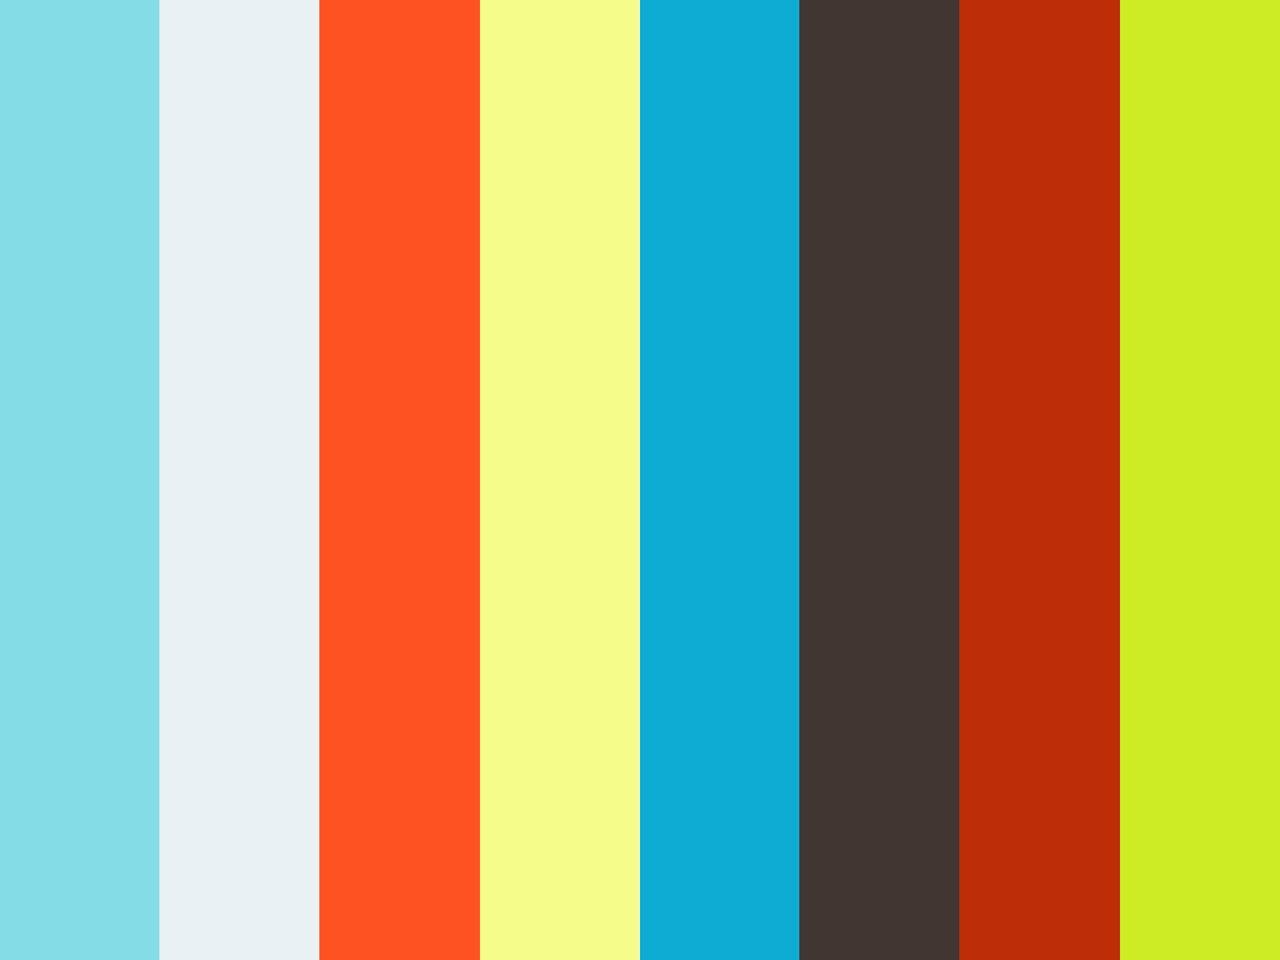 Business Focus Ep82 - Spectral Edge